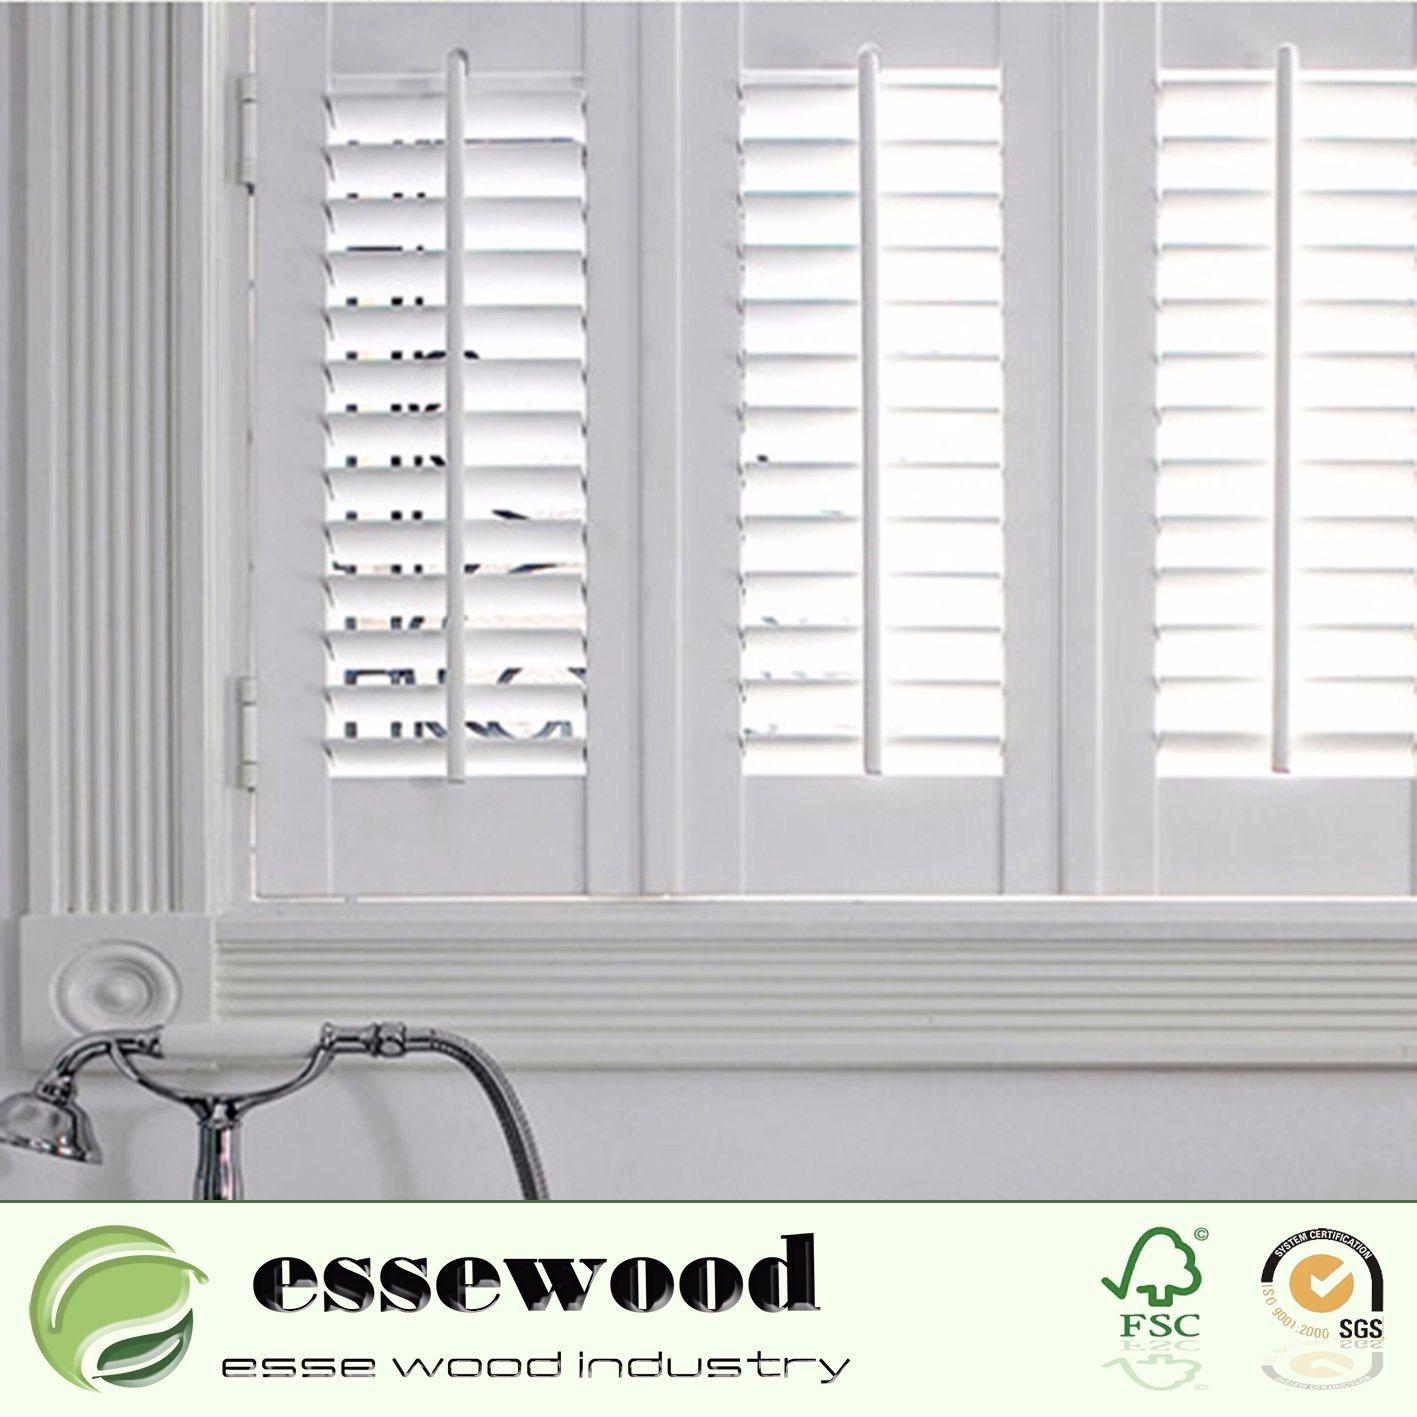 China Window Wood Shutters Plantation Vinyl Shutters For Bedroom Window Decoration China Shutters Window Shutters